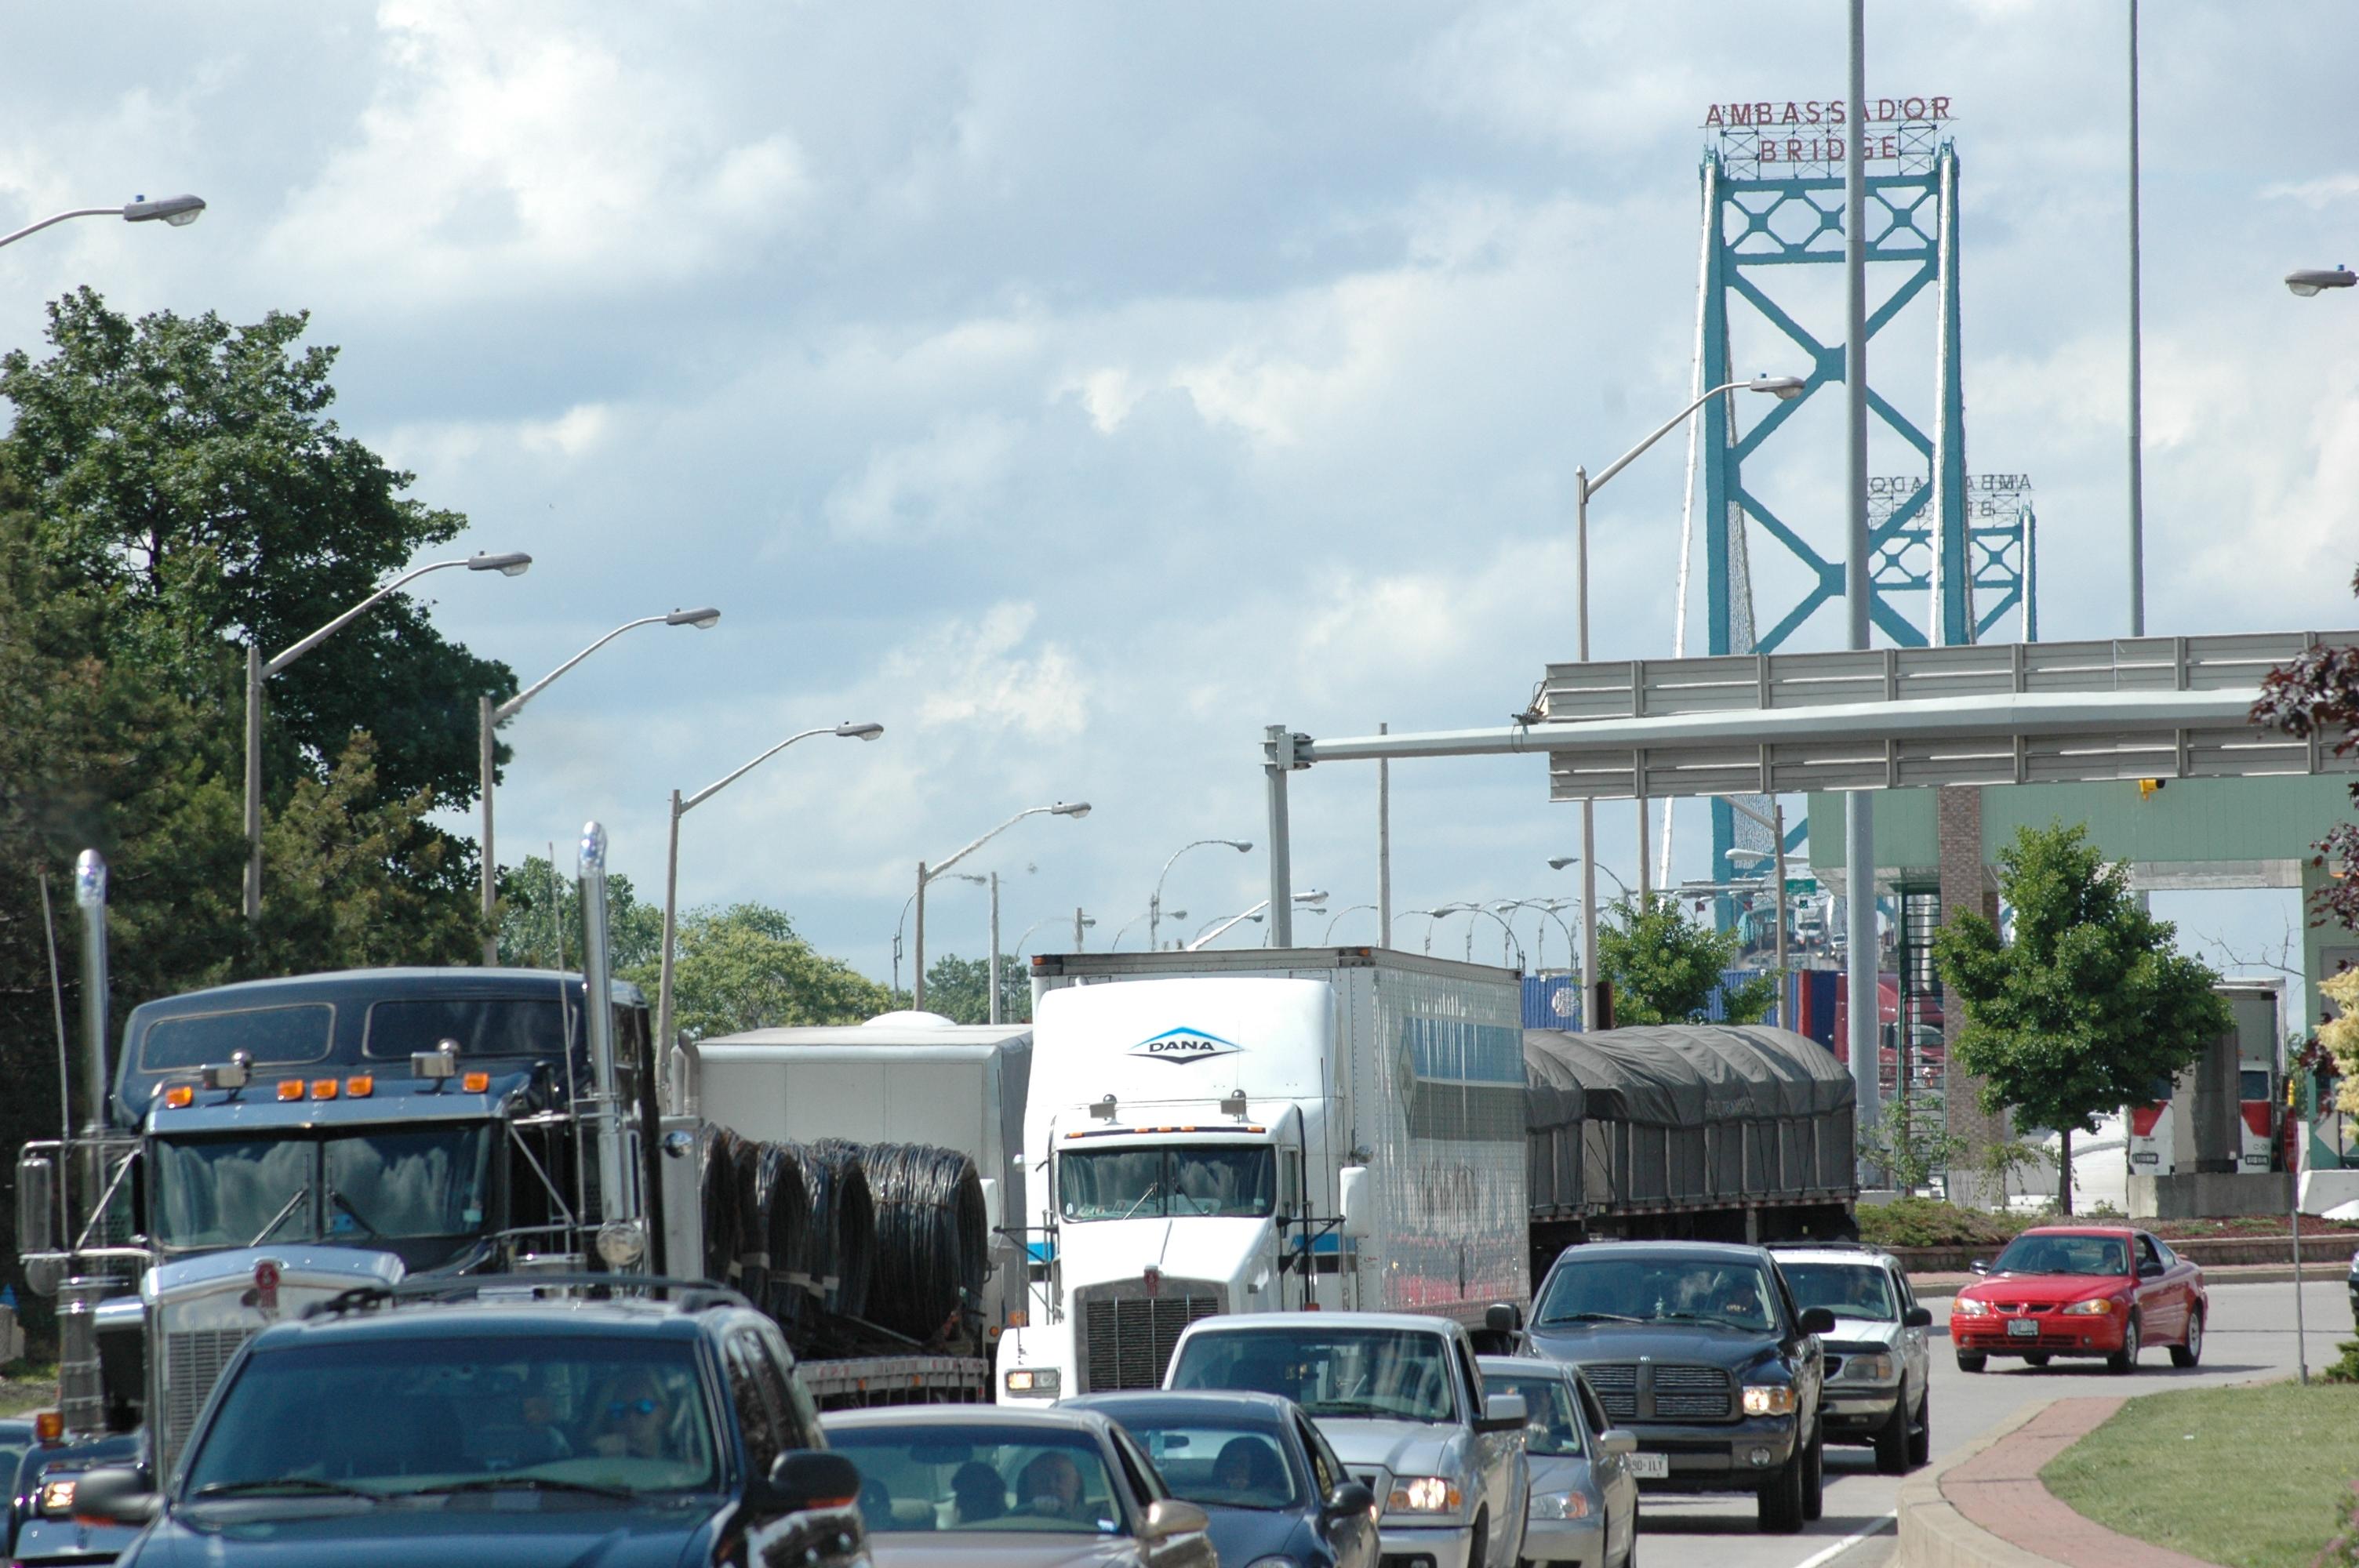 Canada Approves Ambassador Bridge Expansion on Border